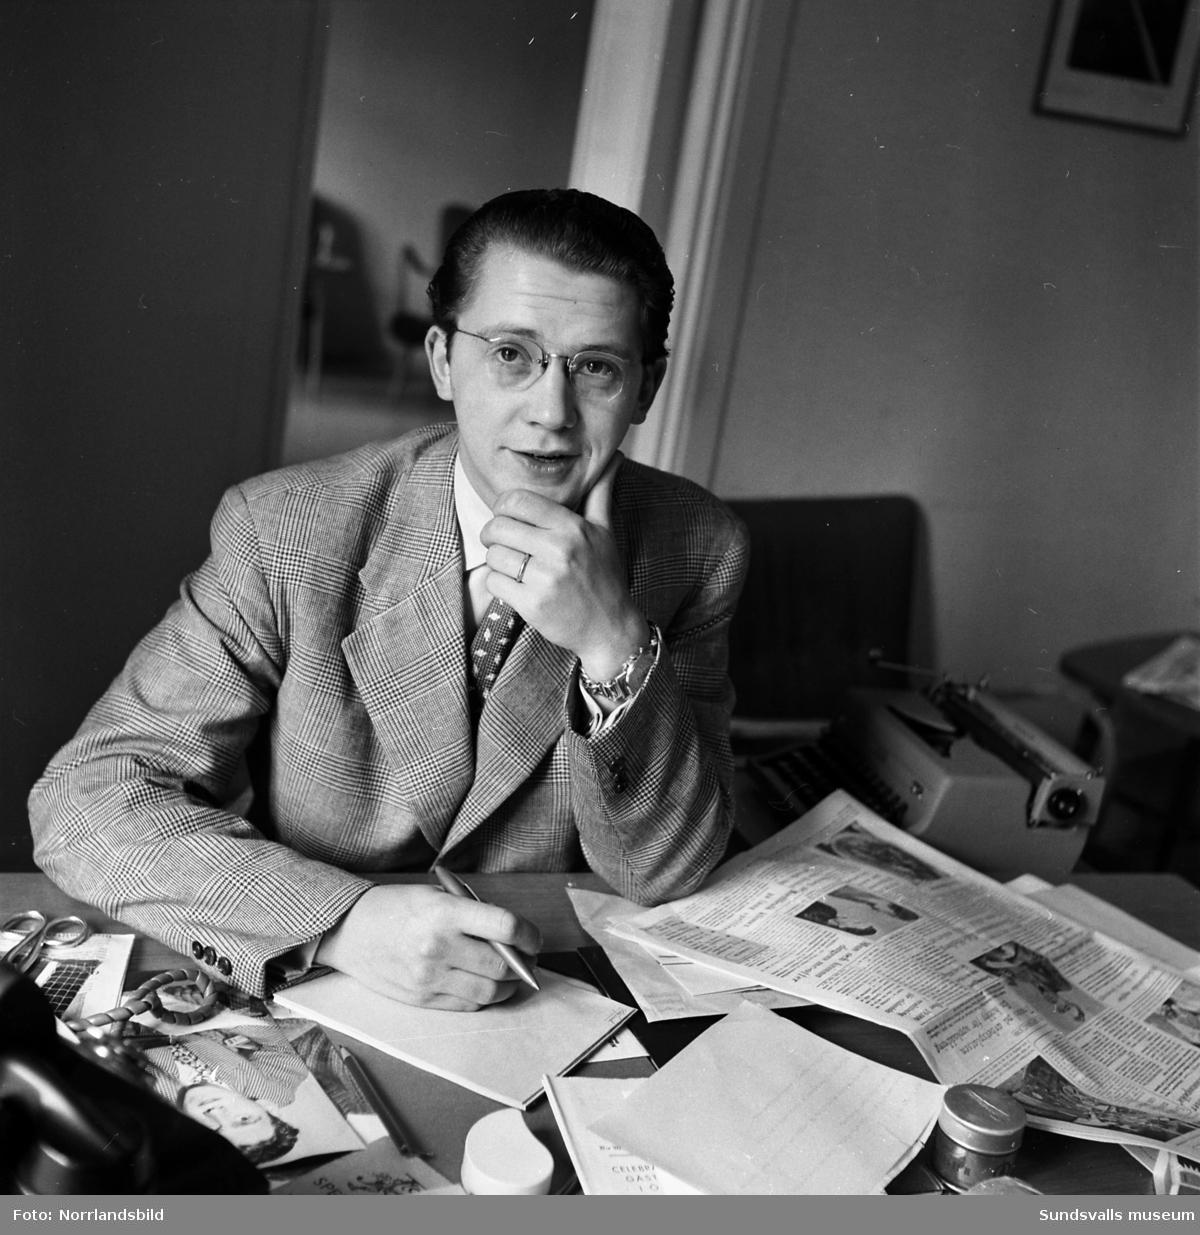 Oskar Haag, Sundsvall, 75 år. IOGT.